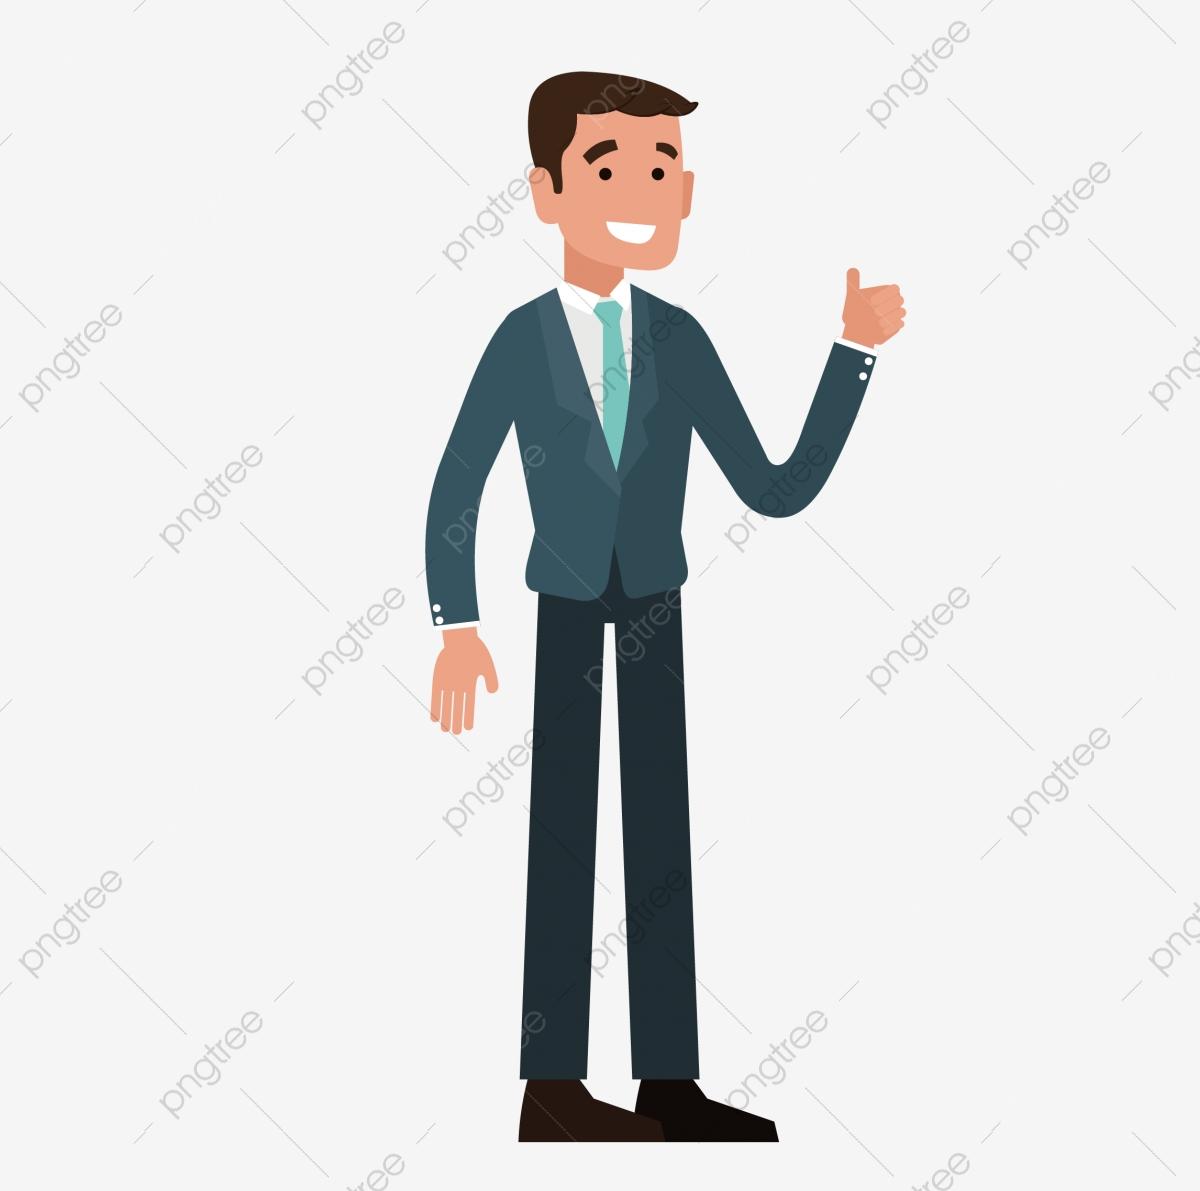 Gesture Cartoon Cartoon Cartoon Man, The Man, Cartoon Man, Business.